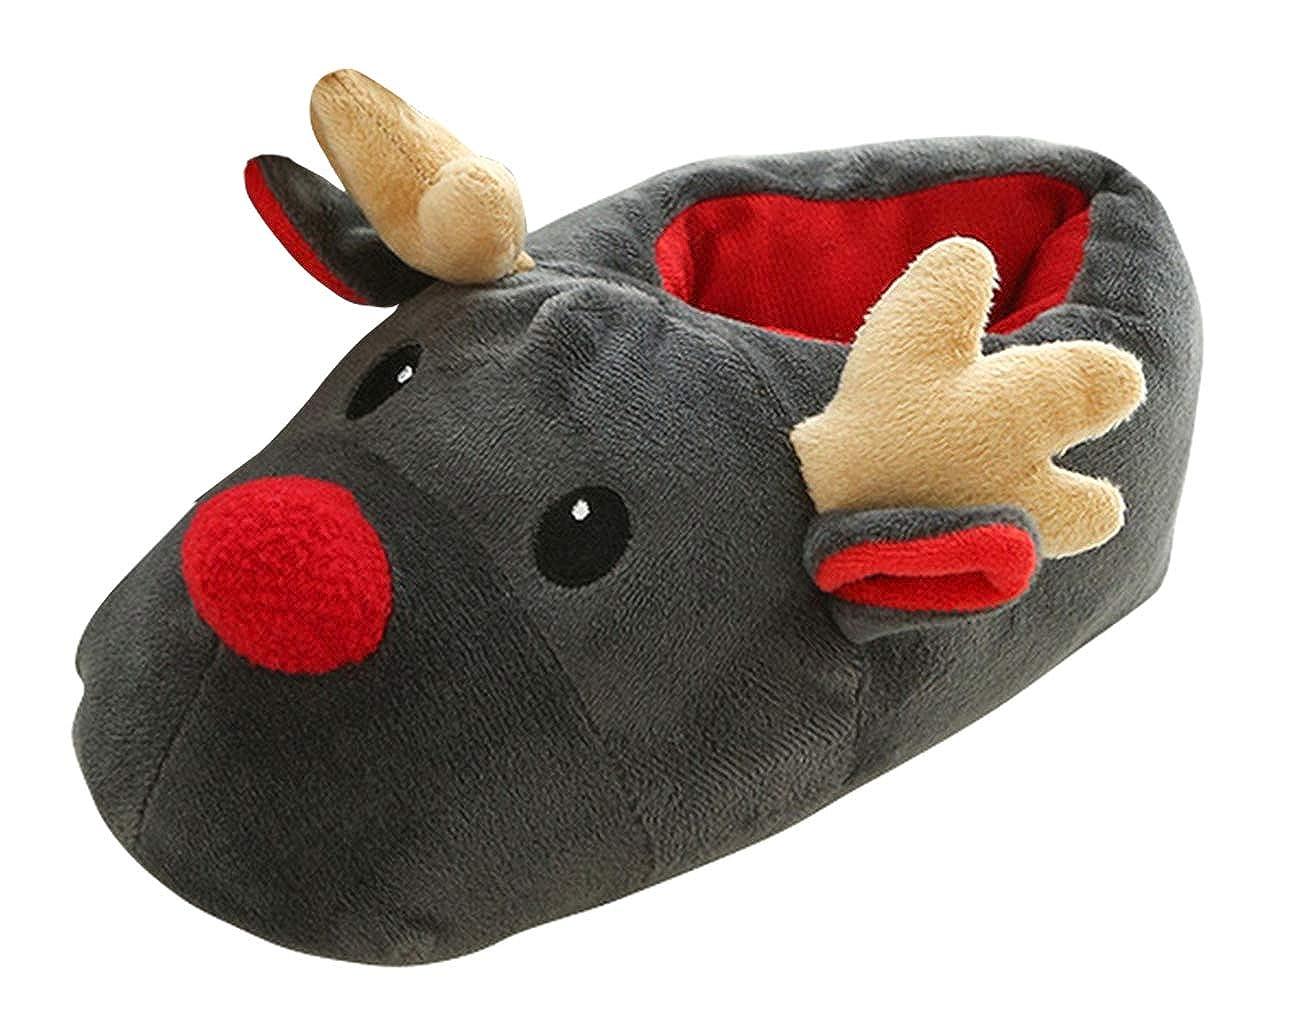 Cloud Kids Plüsch-Pantoffeln Weihnachts Hausschuhe warm Rentier ...